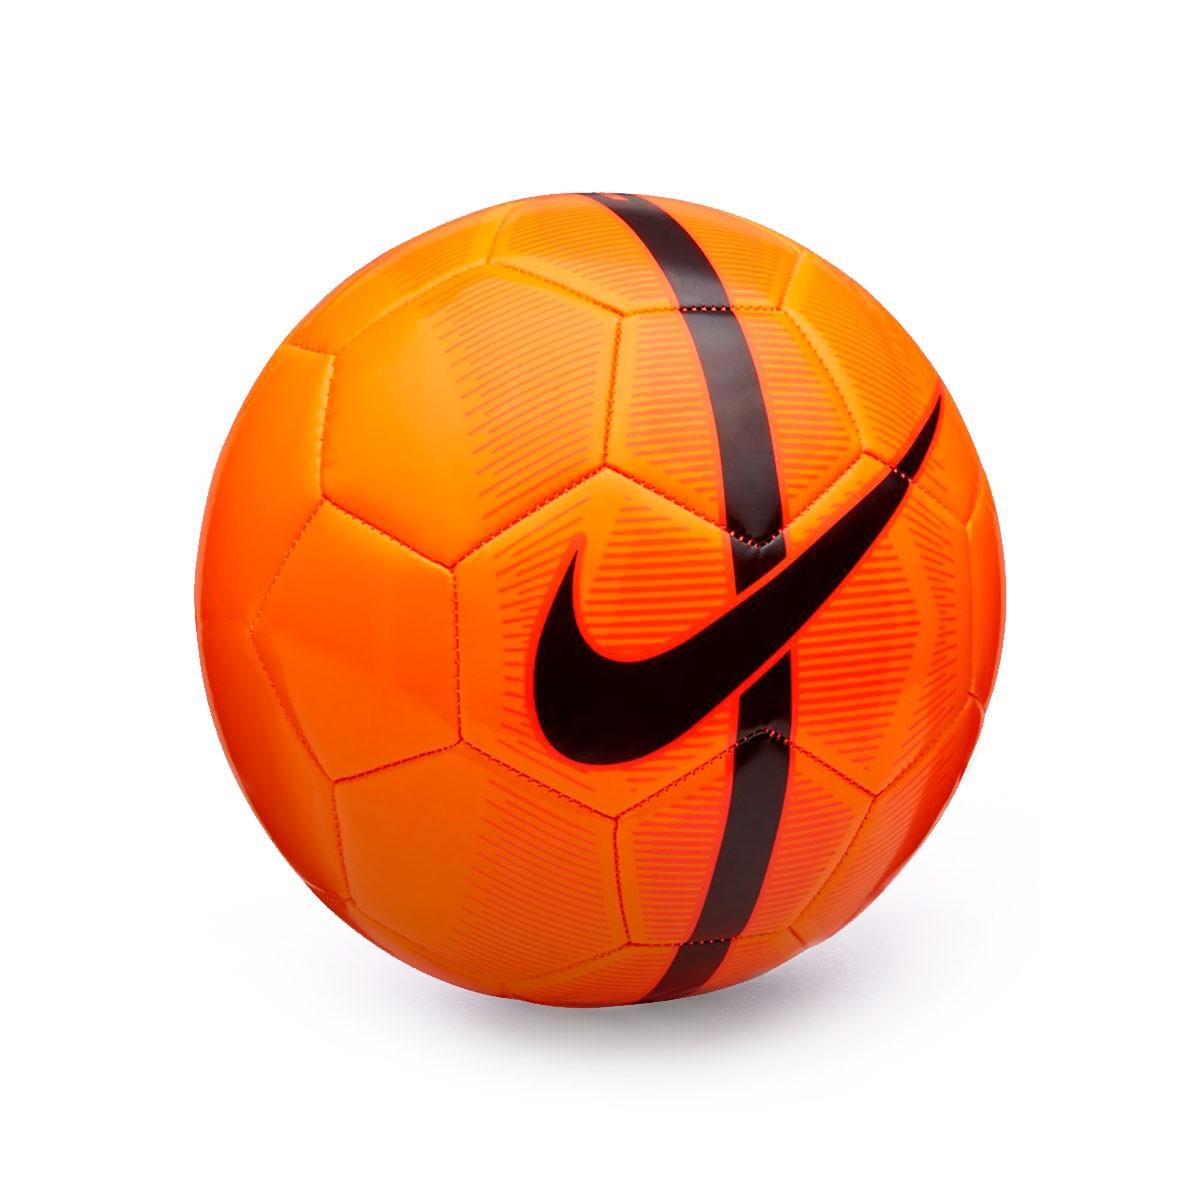 987c8aaa34a67 Ball Nike Mercurial Fade Total orange-Hyper crimson-Black - Tienda ...